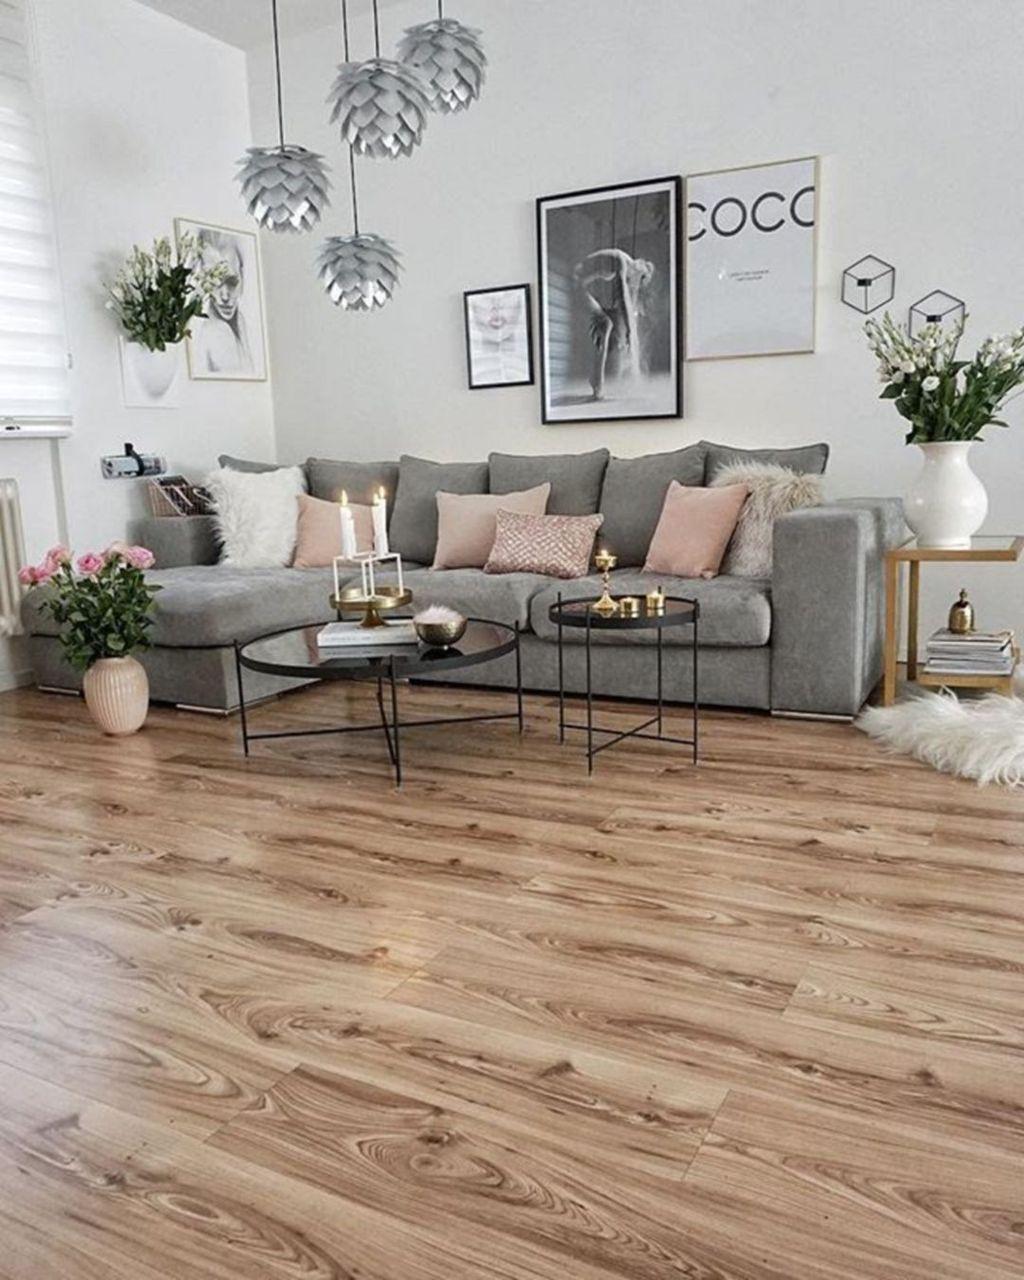 Enchanting Living Room Decor Ideas That Trending This Winter 02